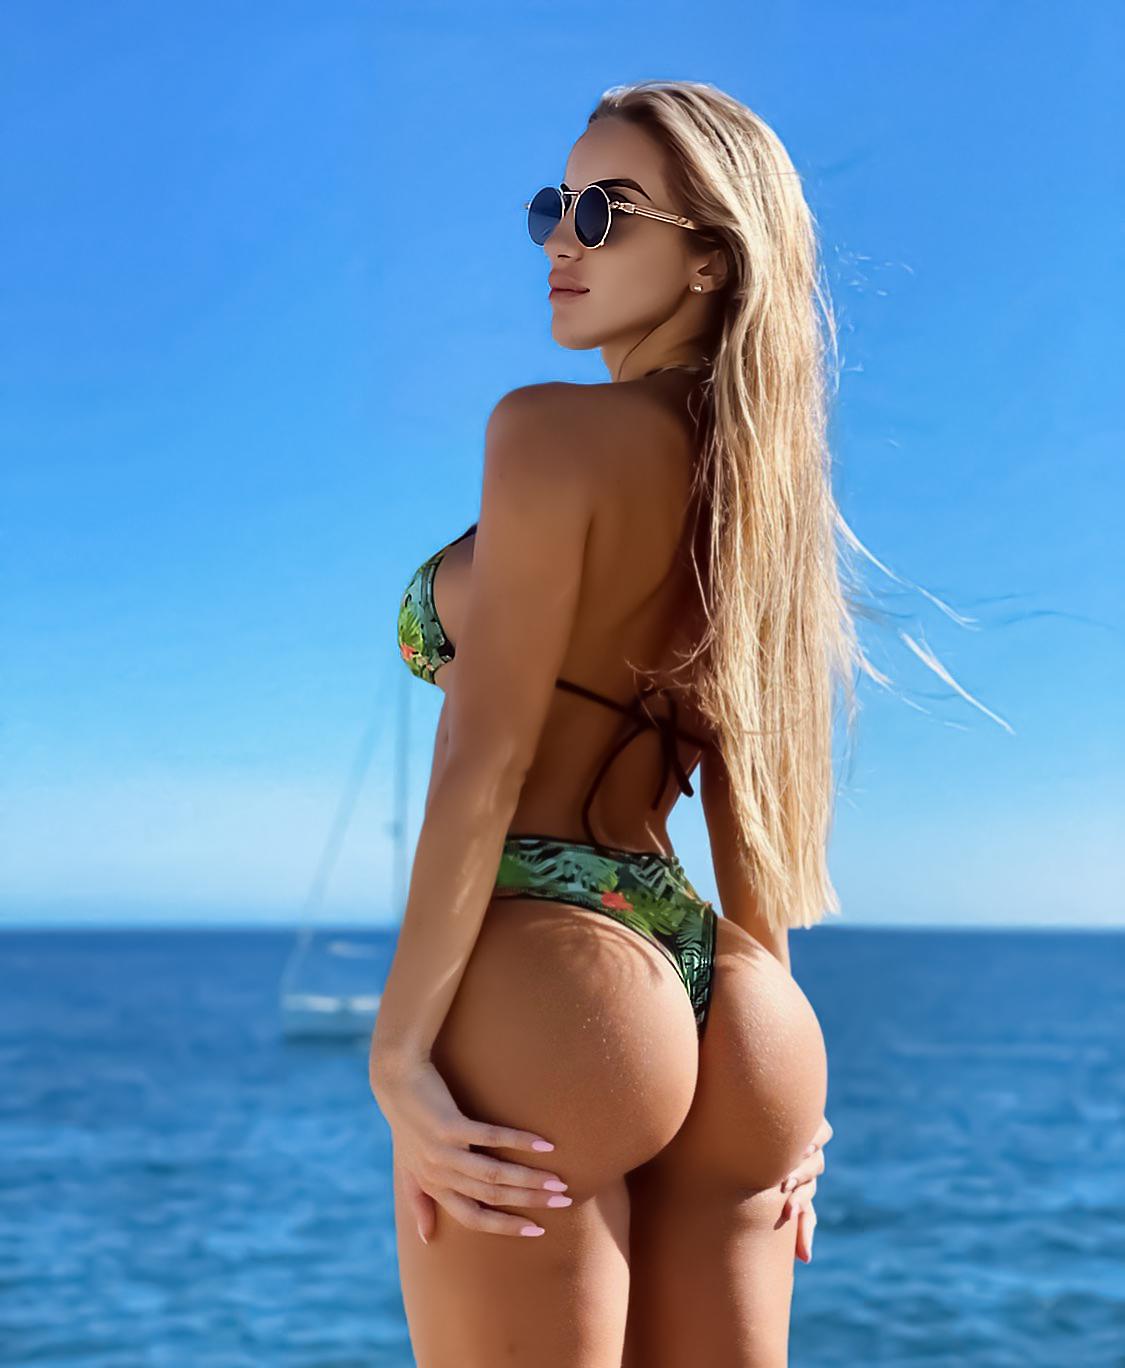 People 1125x1368 Sheila Twin women blonde long hair straight hair sunglasses looking away swimwear bikini ass clear sky water sideboob women with glasses booty scoop